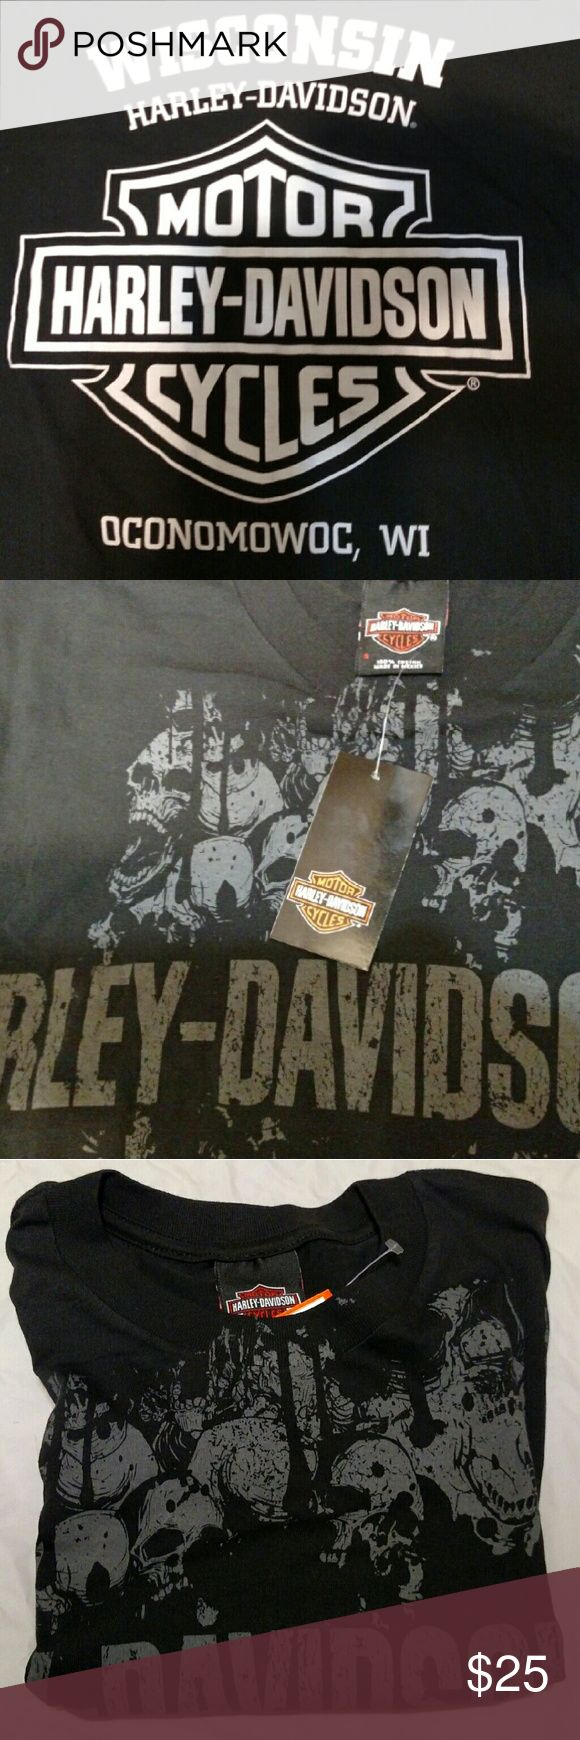 Harley Davidson T-Shirt Harley-Davidson & Gray Skulls on Front. Harley-Davidson Oconomowoc, WI on Back in White Print. Men's Small, Women's Medium. Harley-Davidson Tops Tees - Short Sleeve